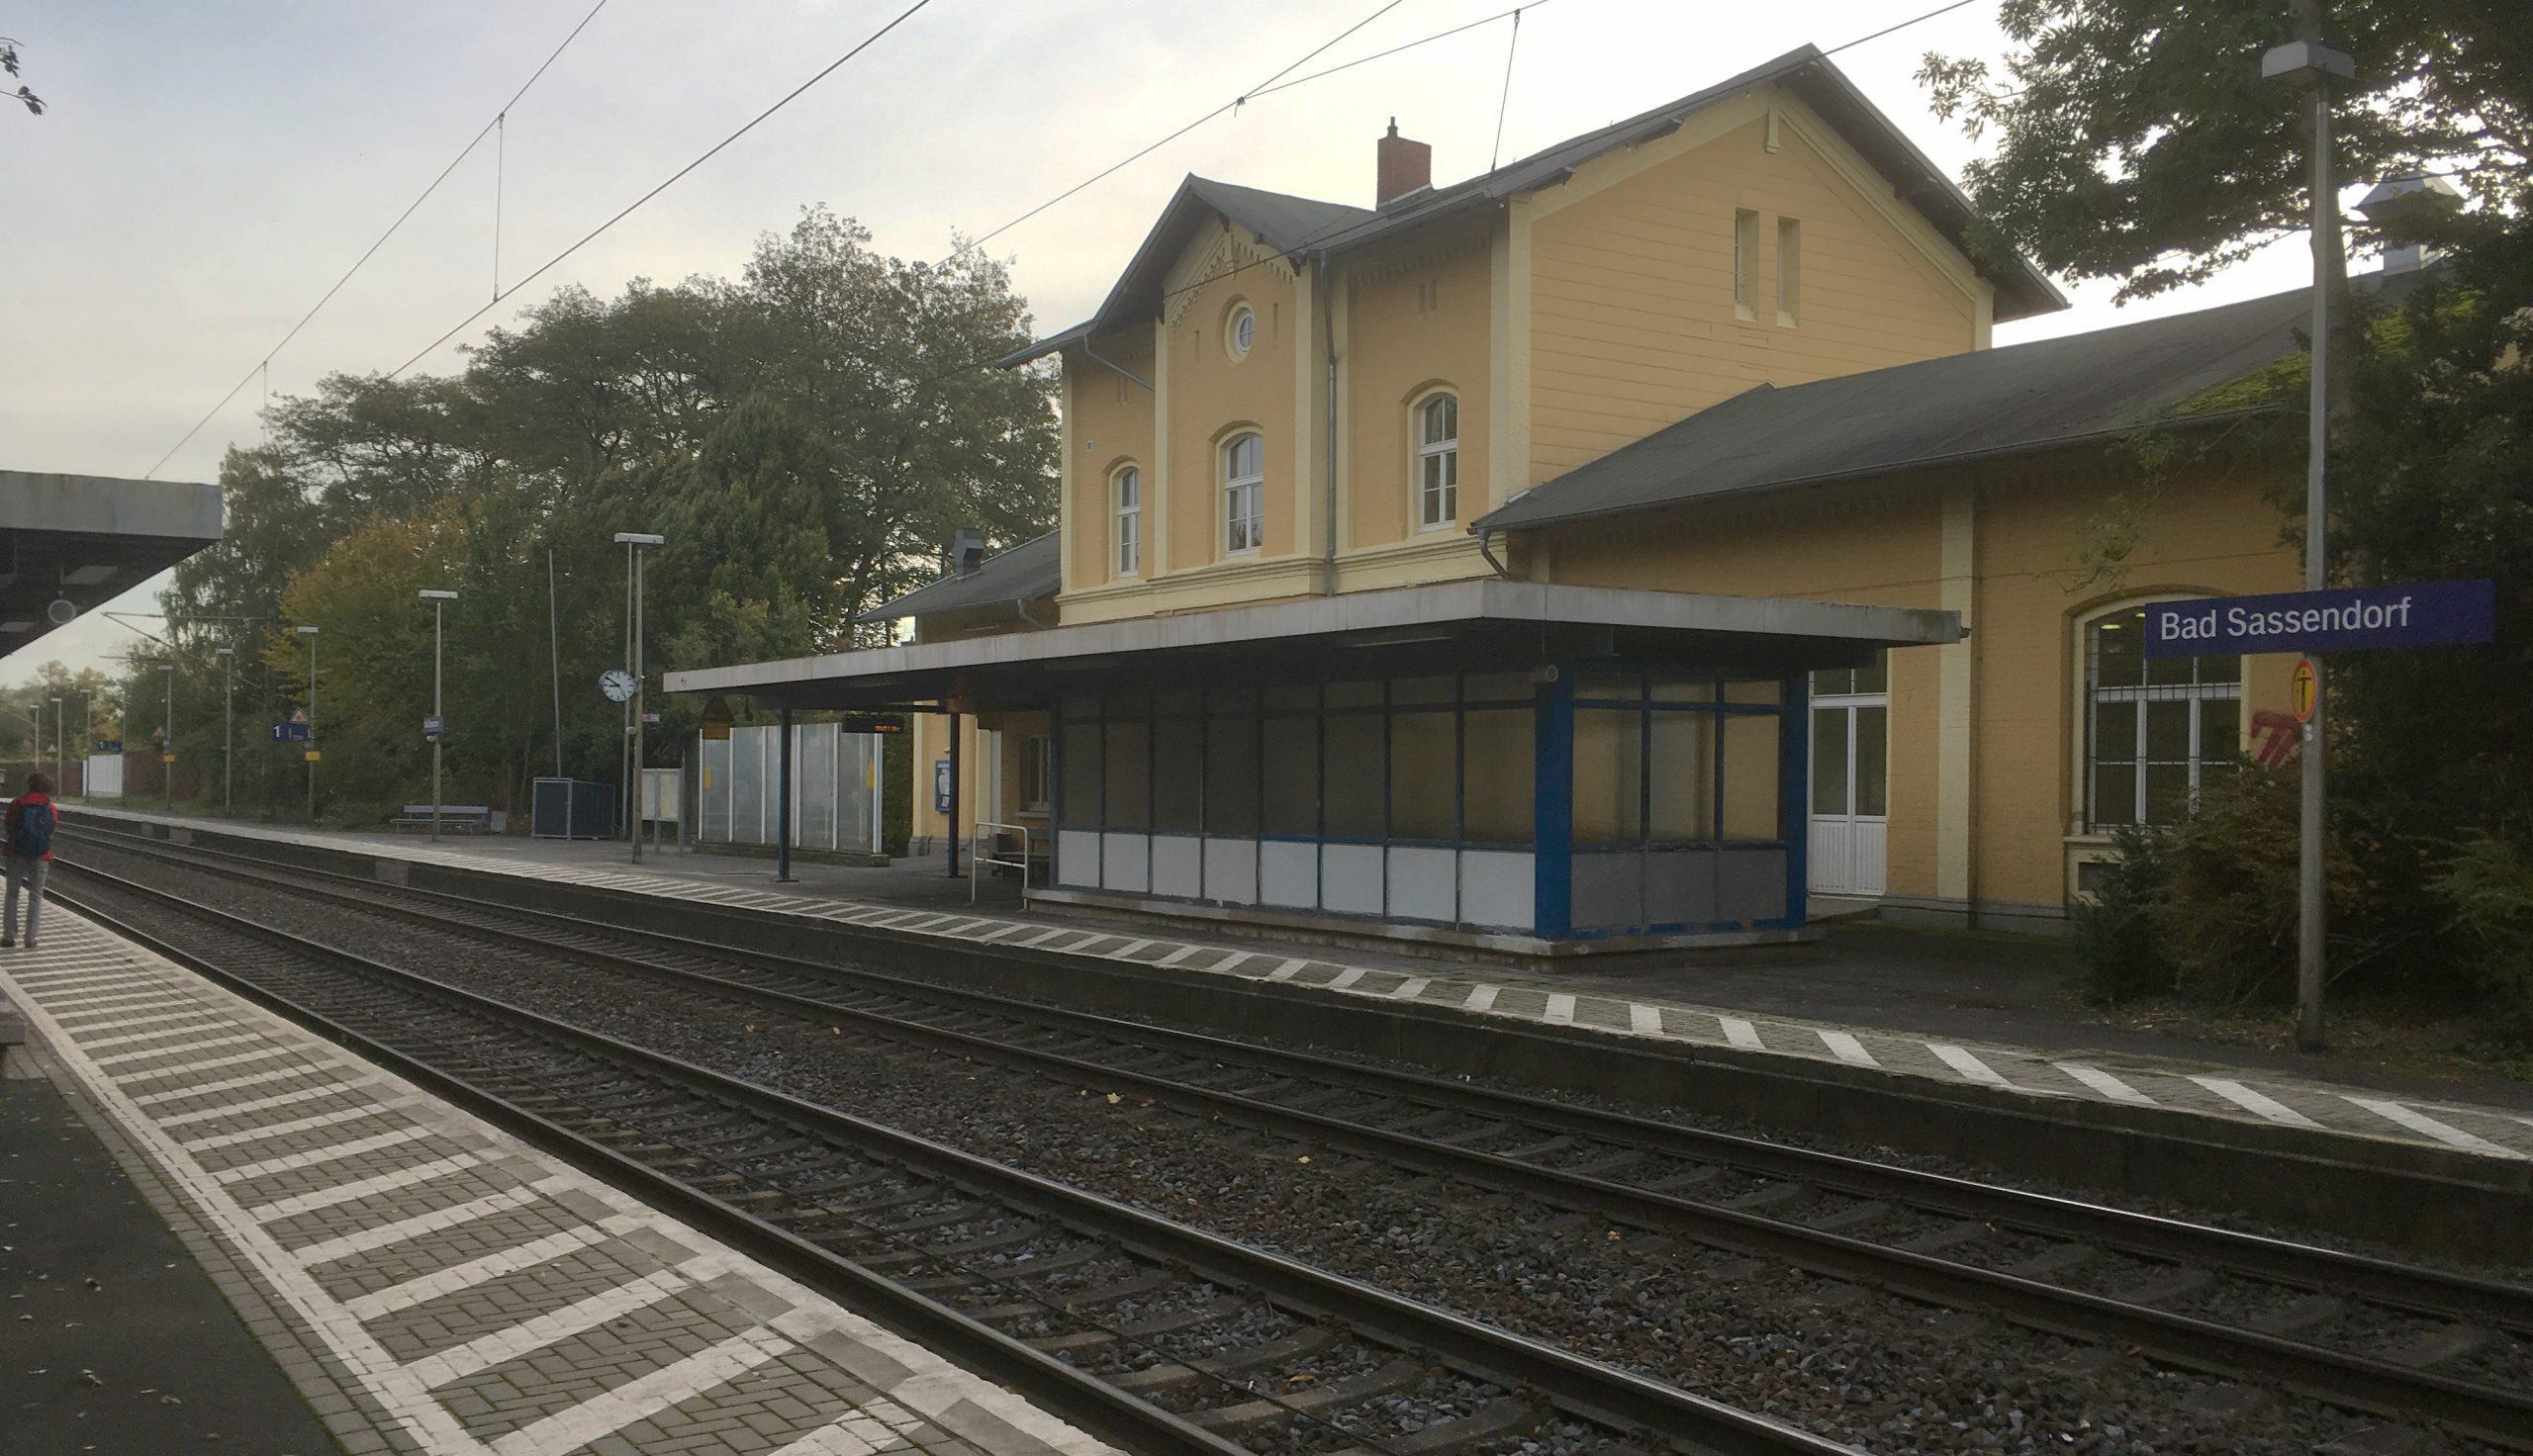 Projektbild 2, Bahnhof | Bad Sassendorf